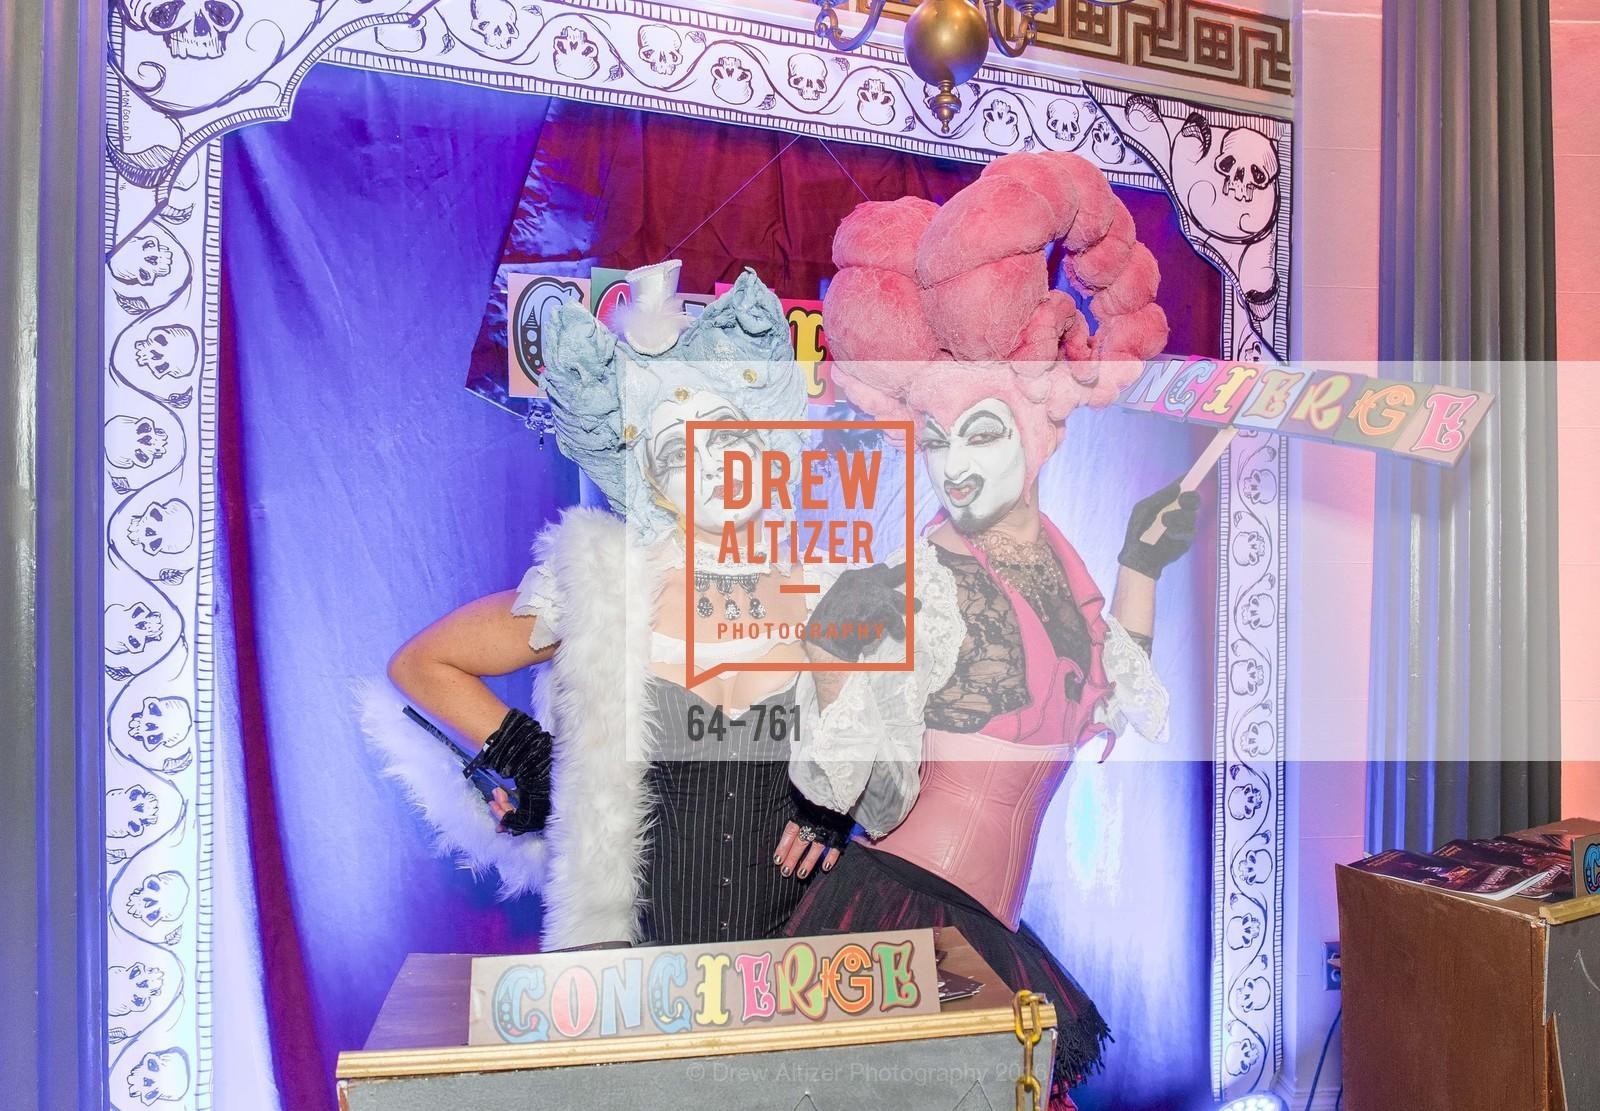 Foufou Ha, Edwardian Ball, Regency Center, January 24th, 2016,Drew Altizer, Drew Altizer Photography, full-service agency, private events, San Francisco photographer, photographer california